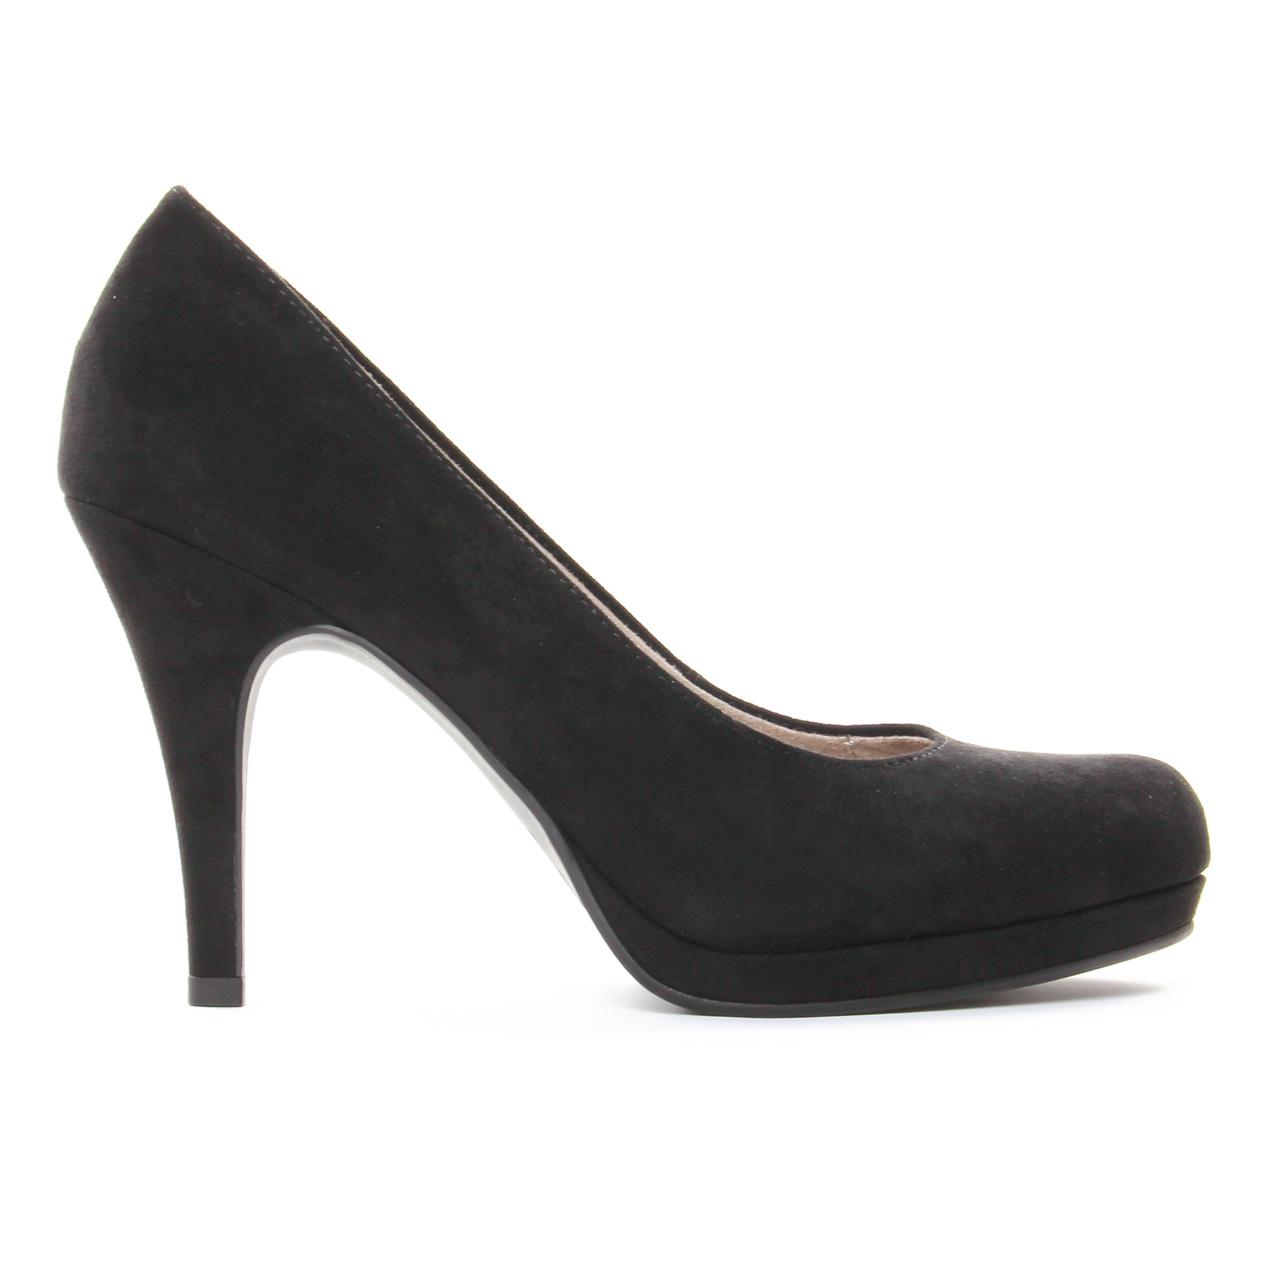 22407, Escarpins Femme, Noir (Black), 38 EUTamaris